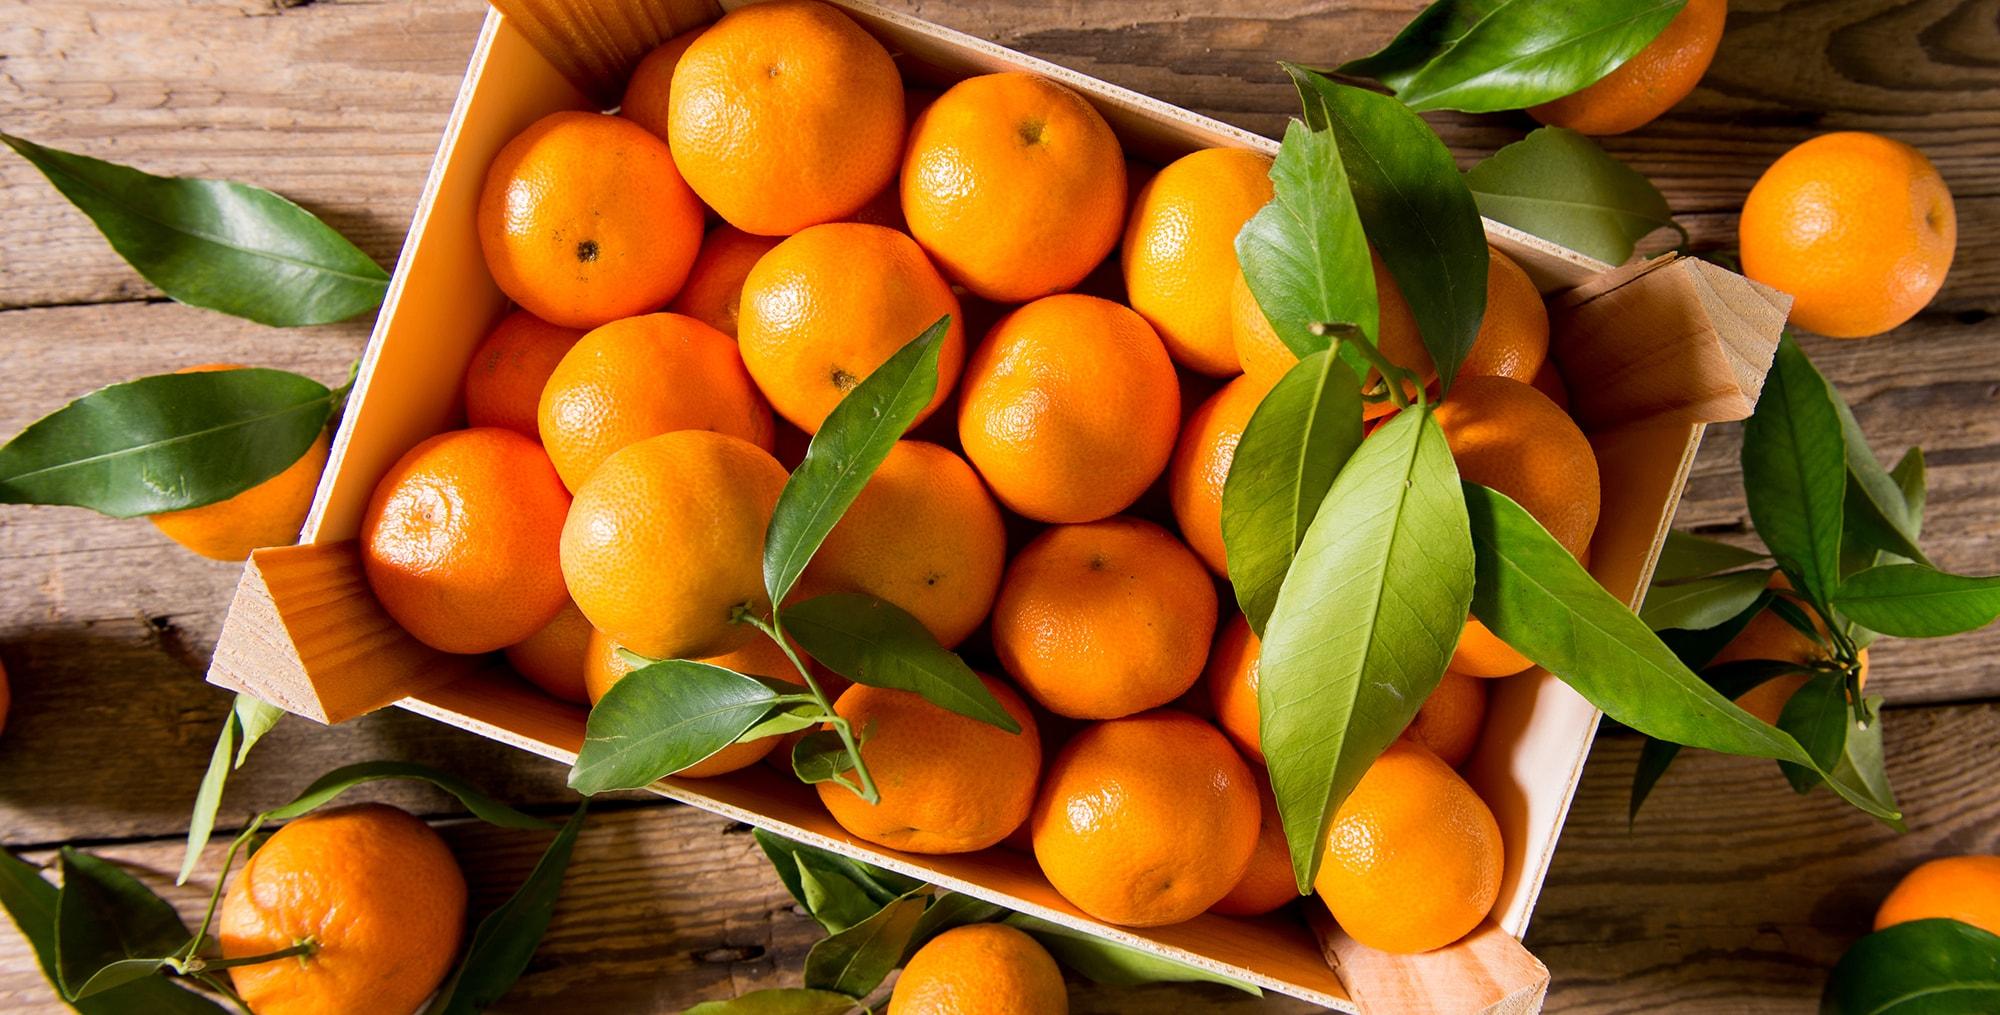 mandarins2-min